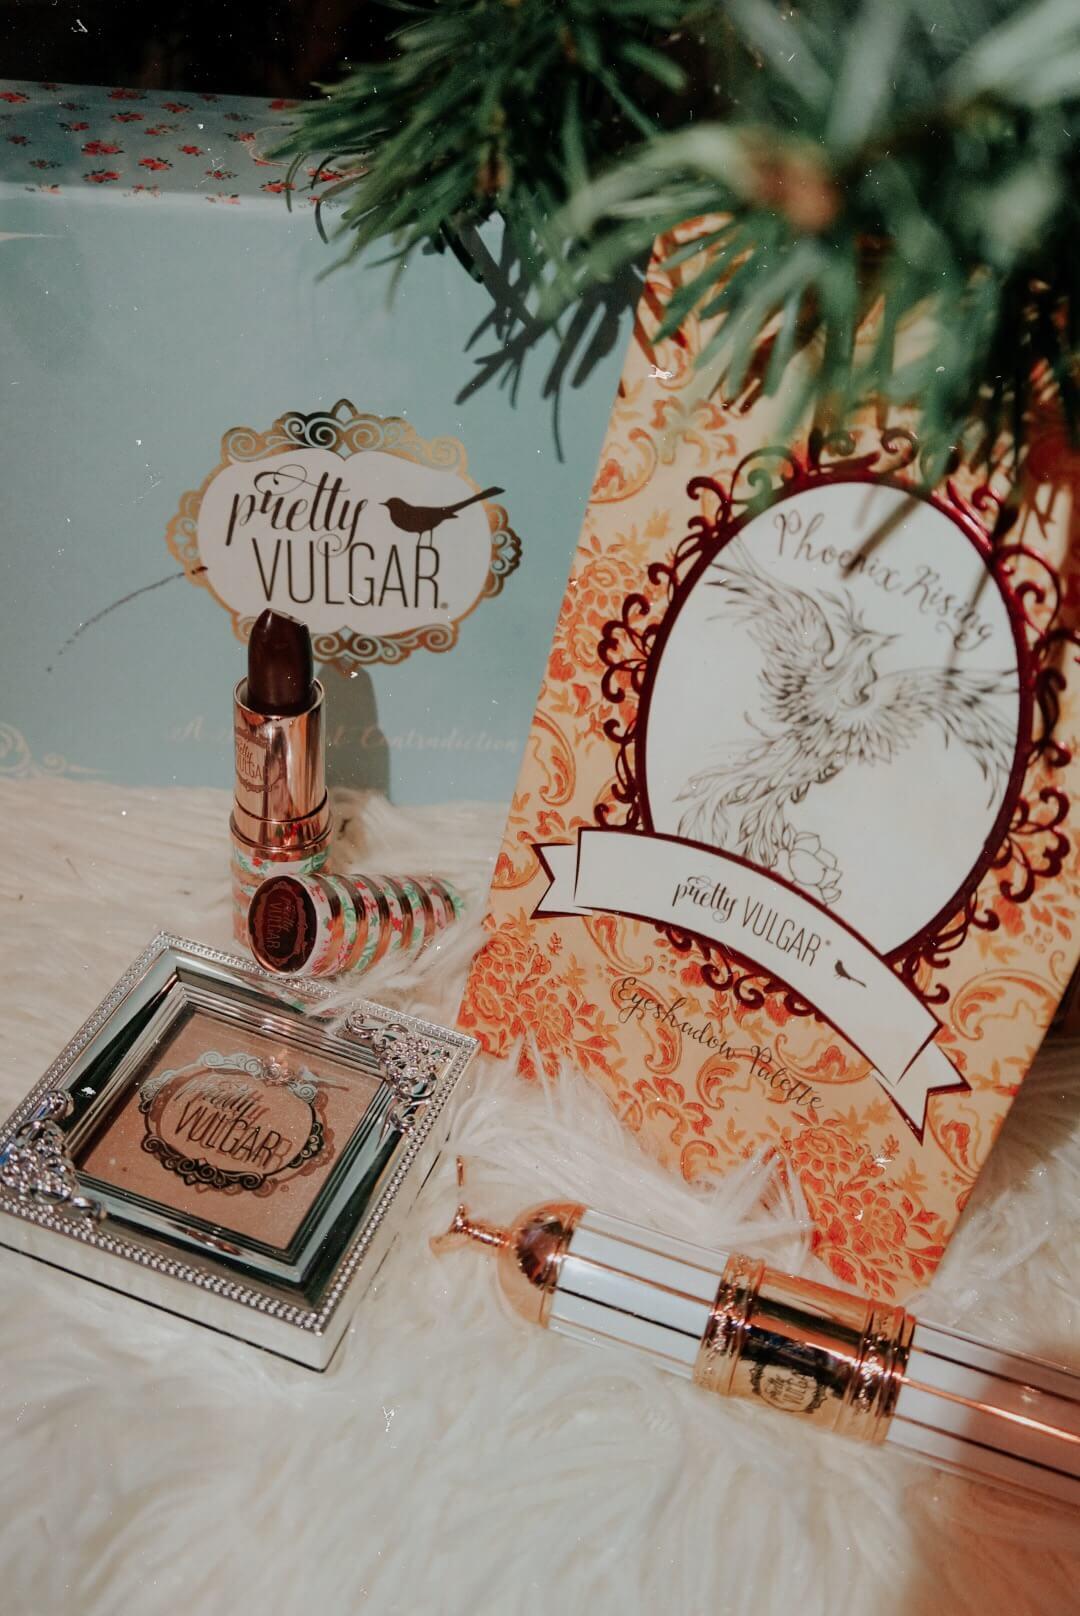 sandra stoicovici benefit dior origins sephora kiehls produse beauty